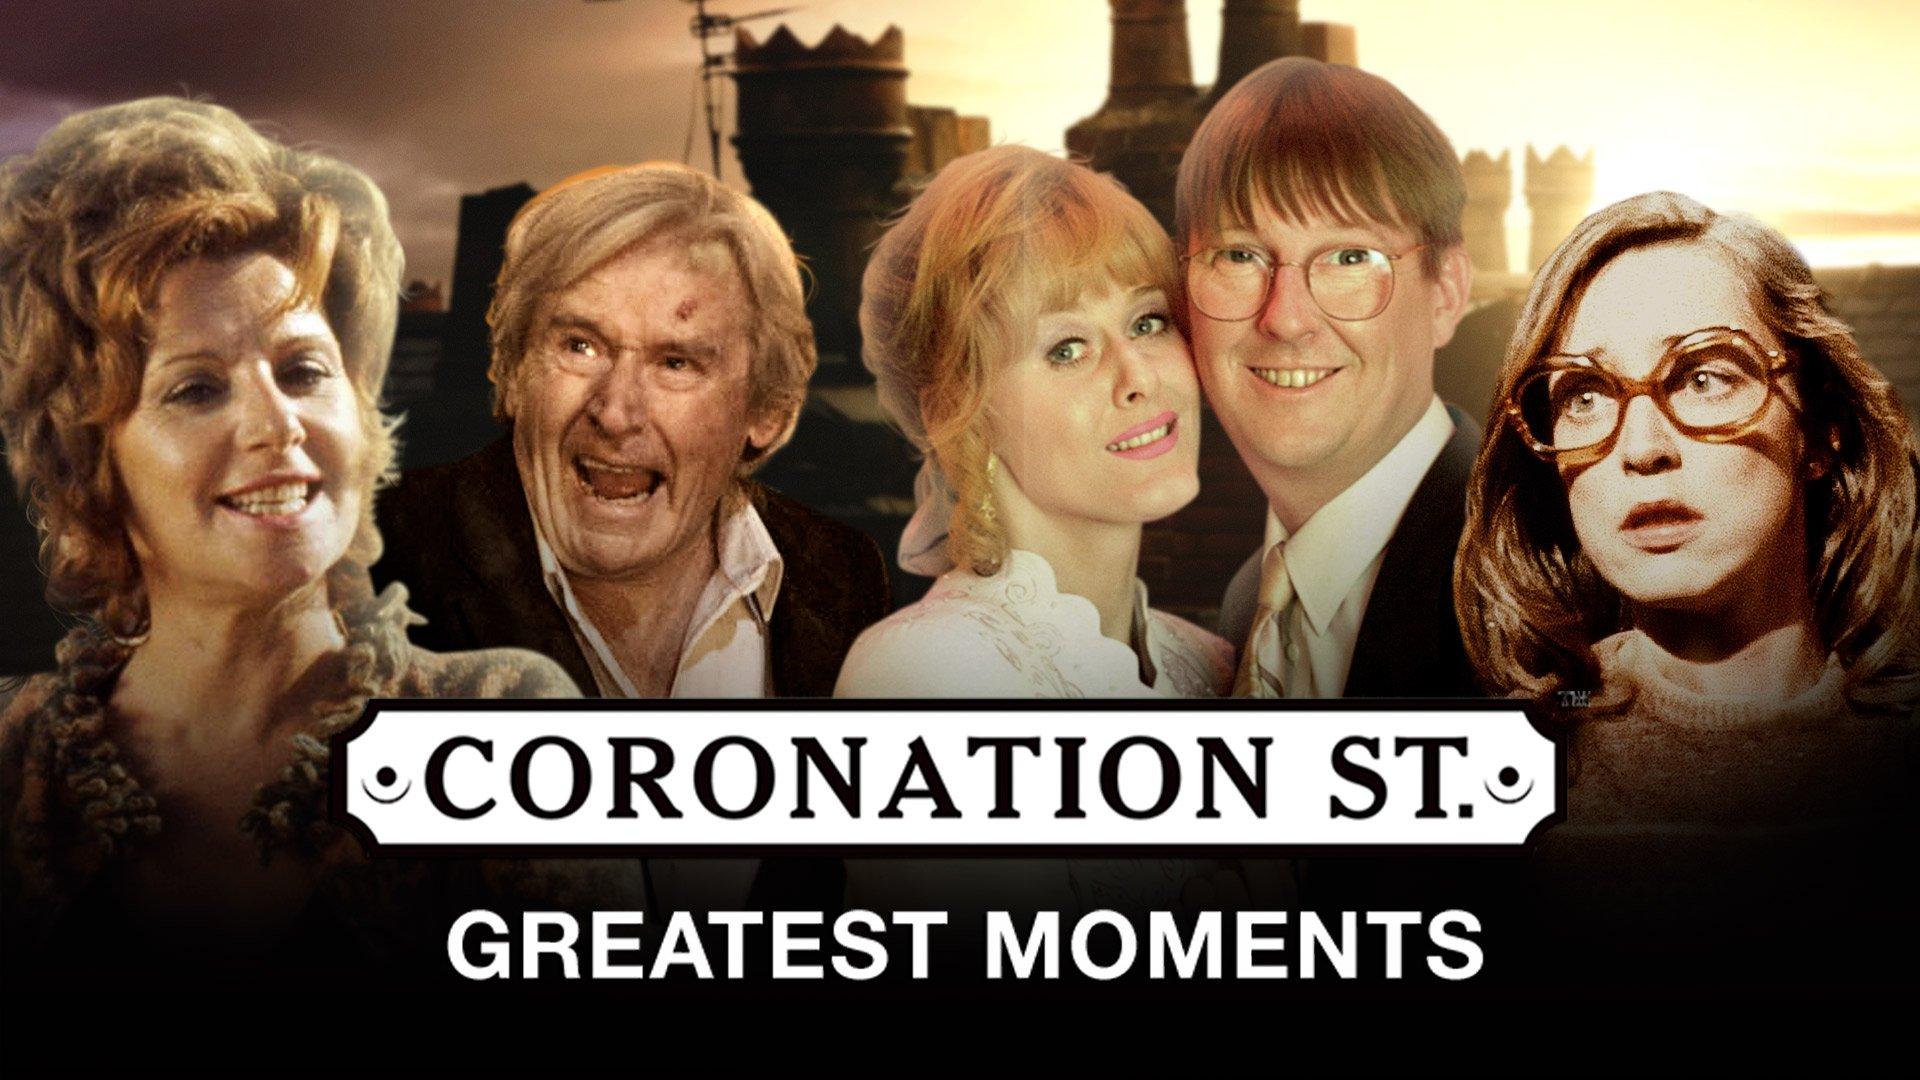 Coronation Street's Greatest Moments on BritBox UK